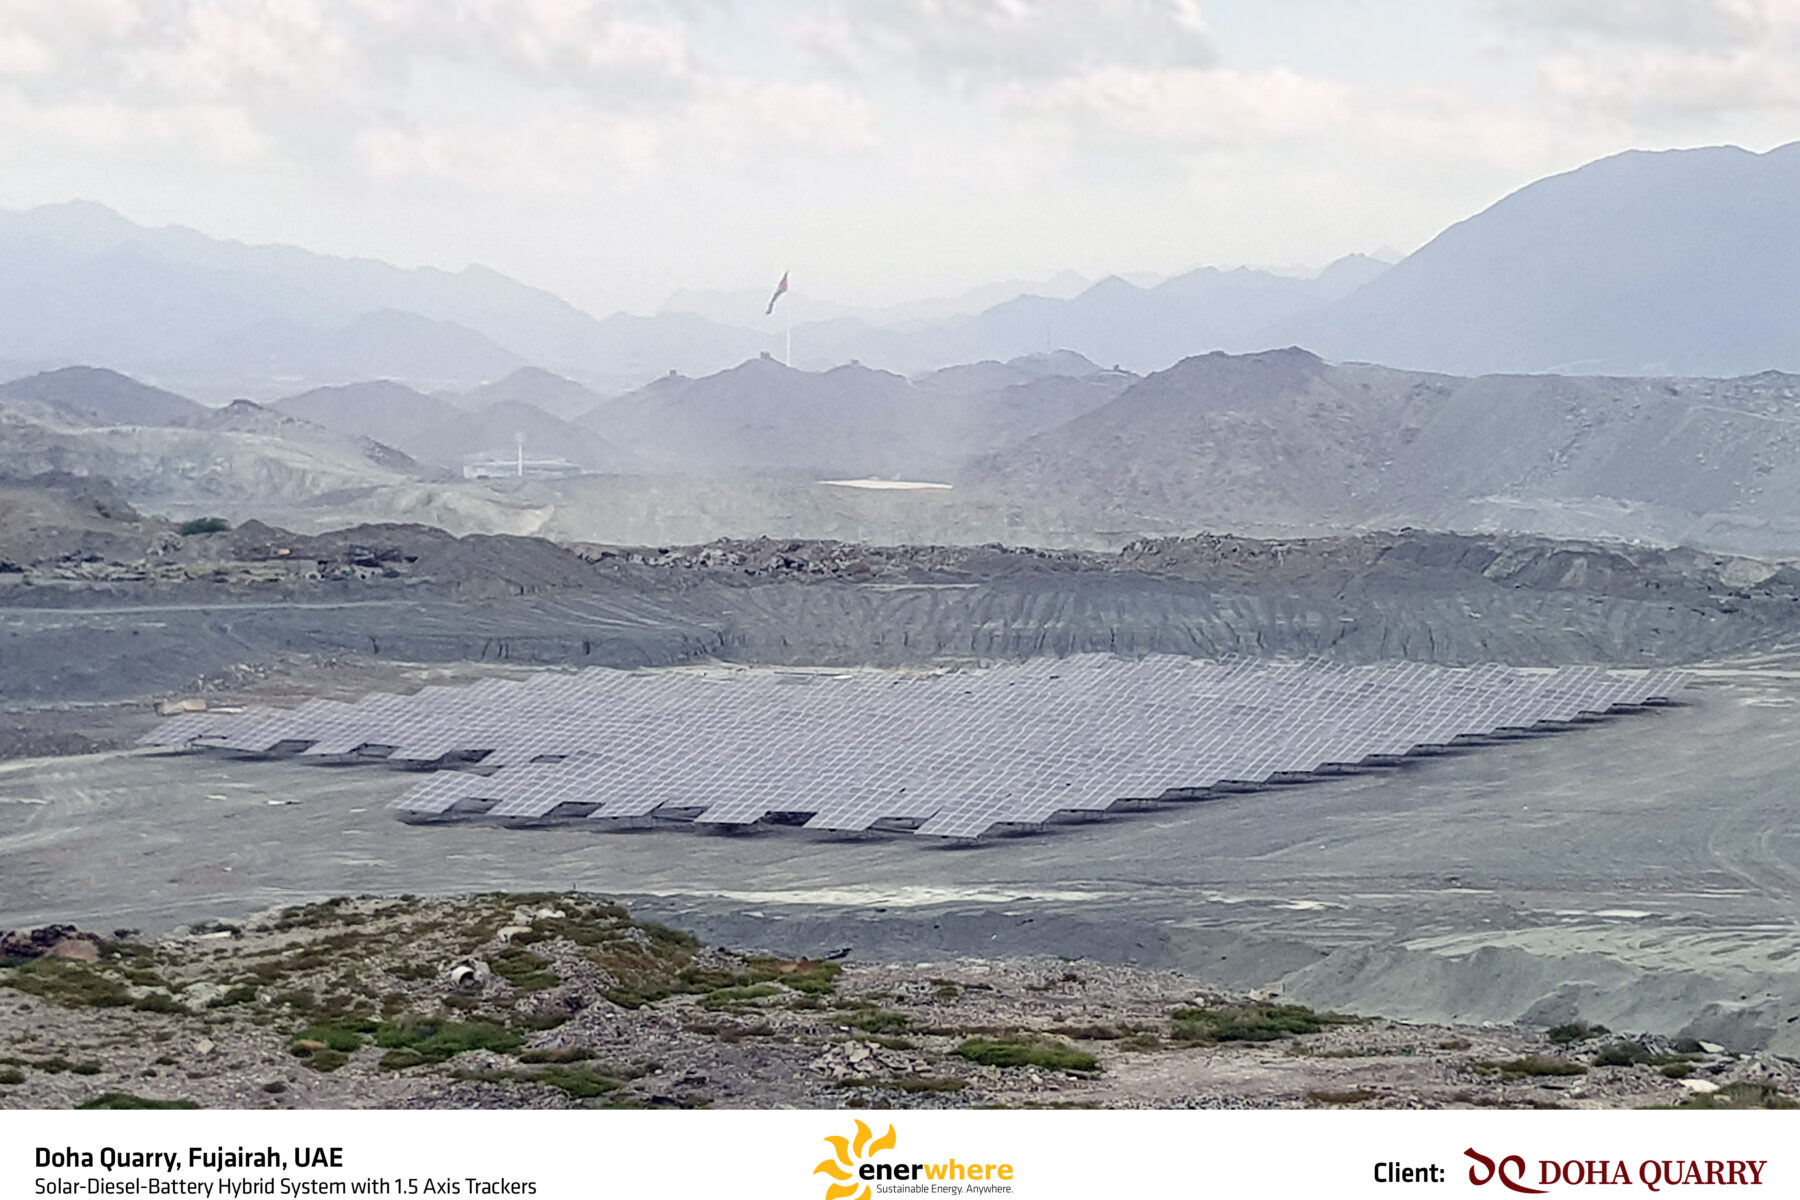 Doha Quarry Mining Fujairah